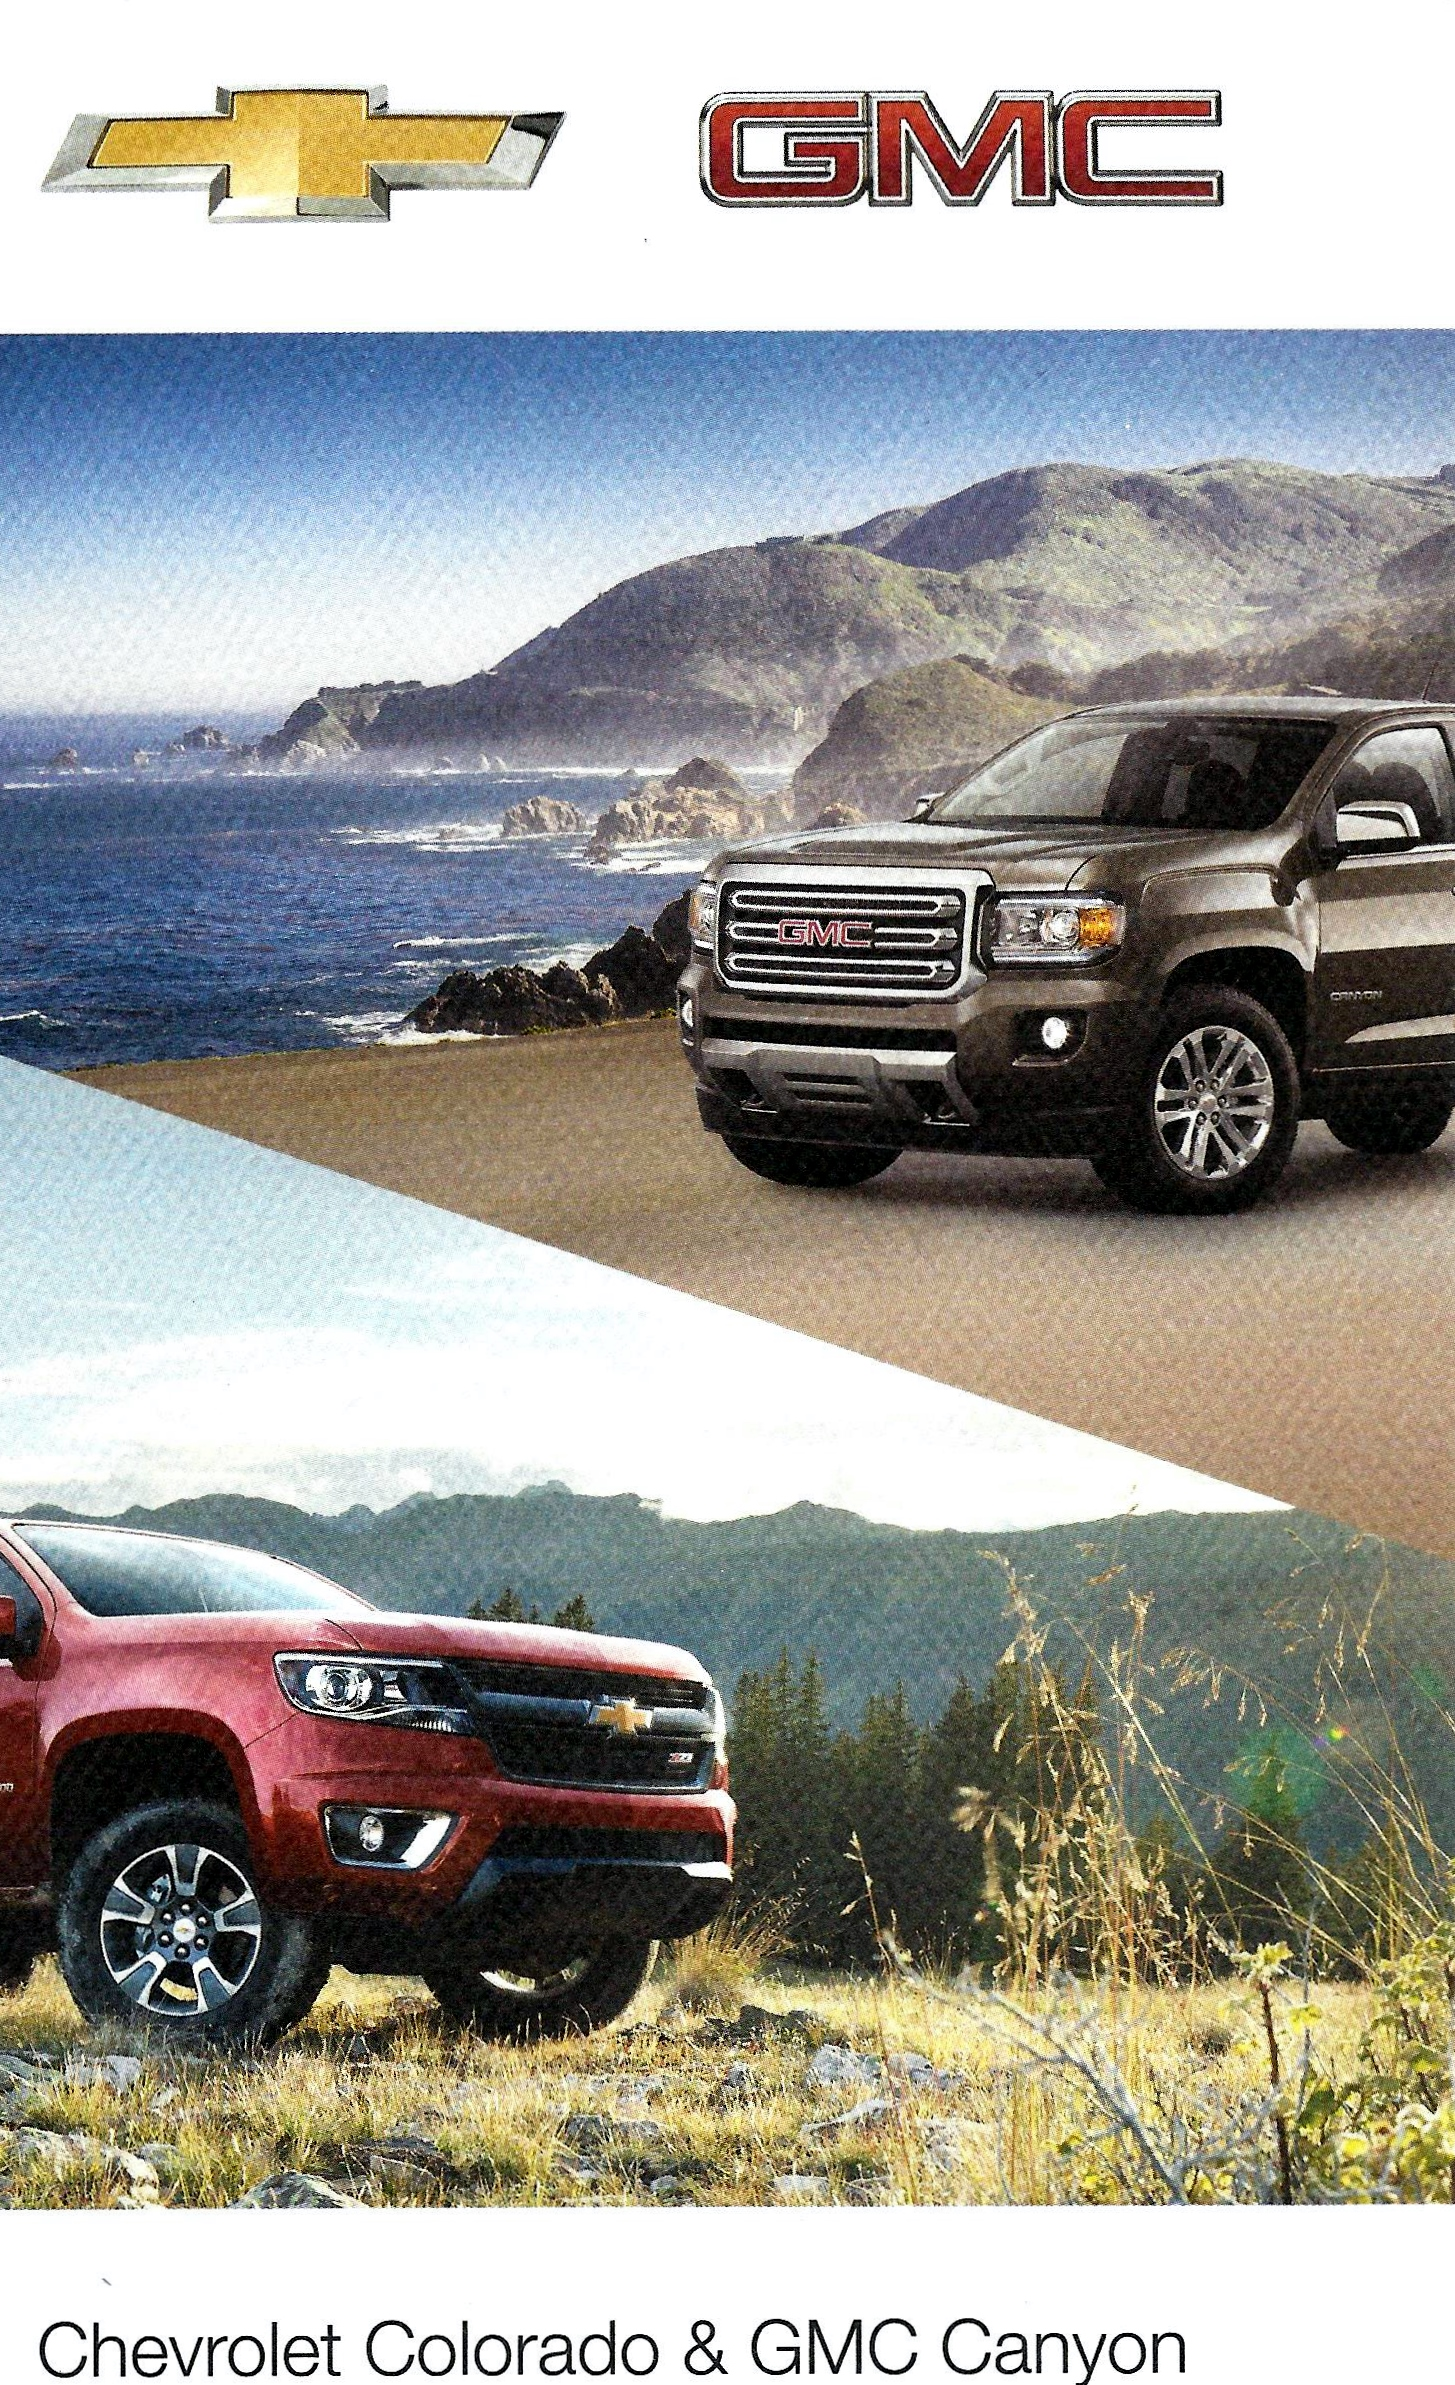 Driven 2015 Chevrolet Colorado and GMC Canyon Pickups Matt Stone Cars